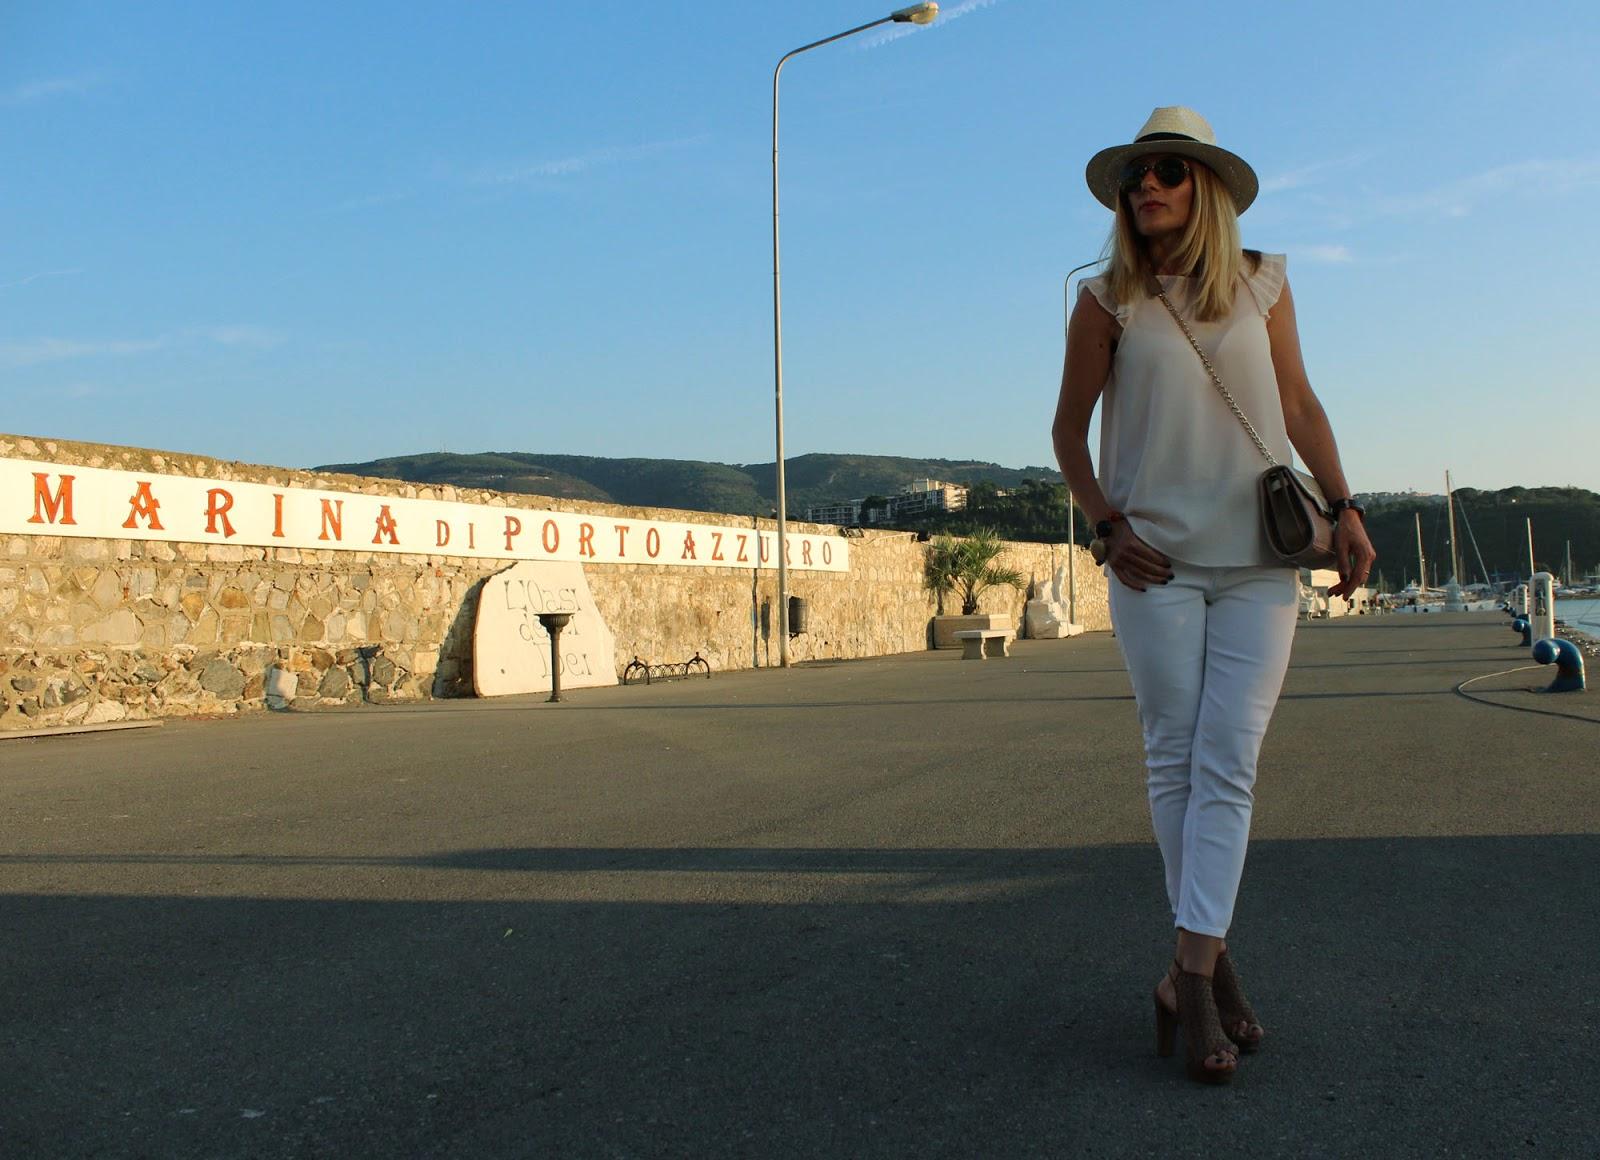 Eniwhere Fashion - Elba Porto Azzurro - Skinny jeans white and Panama Hat